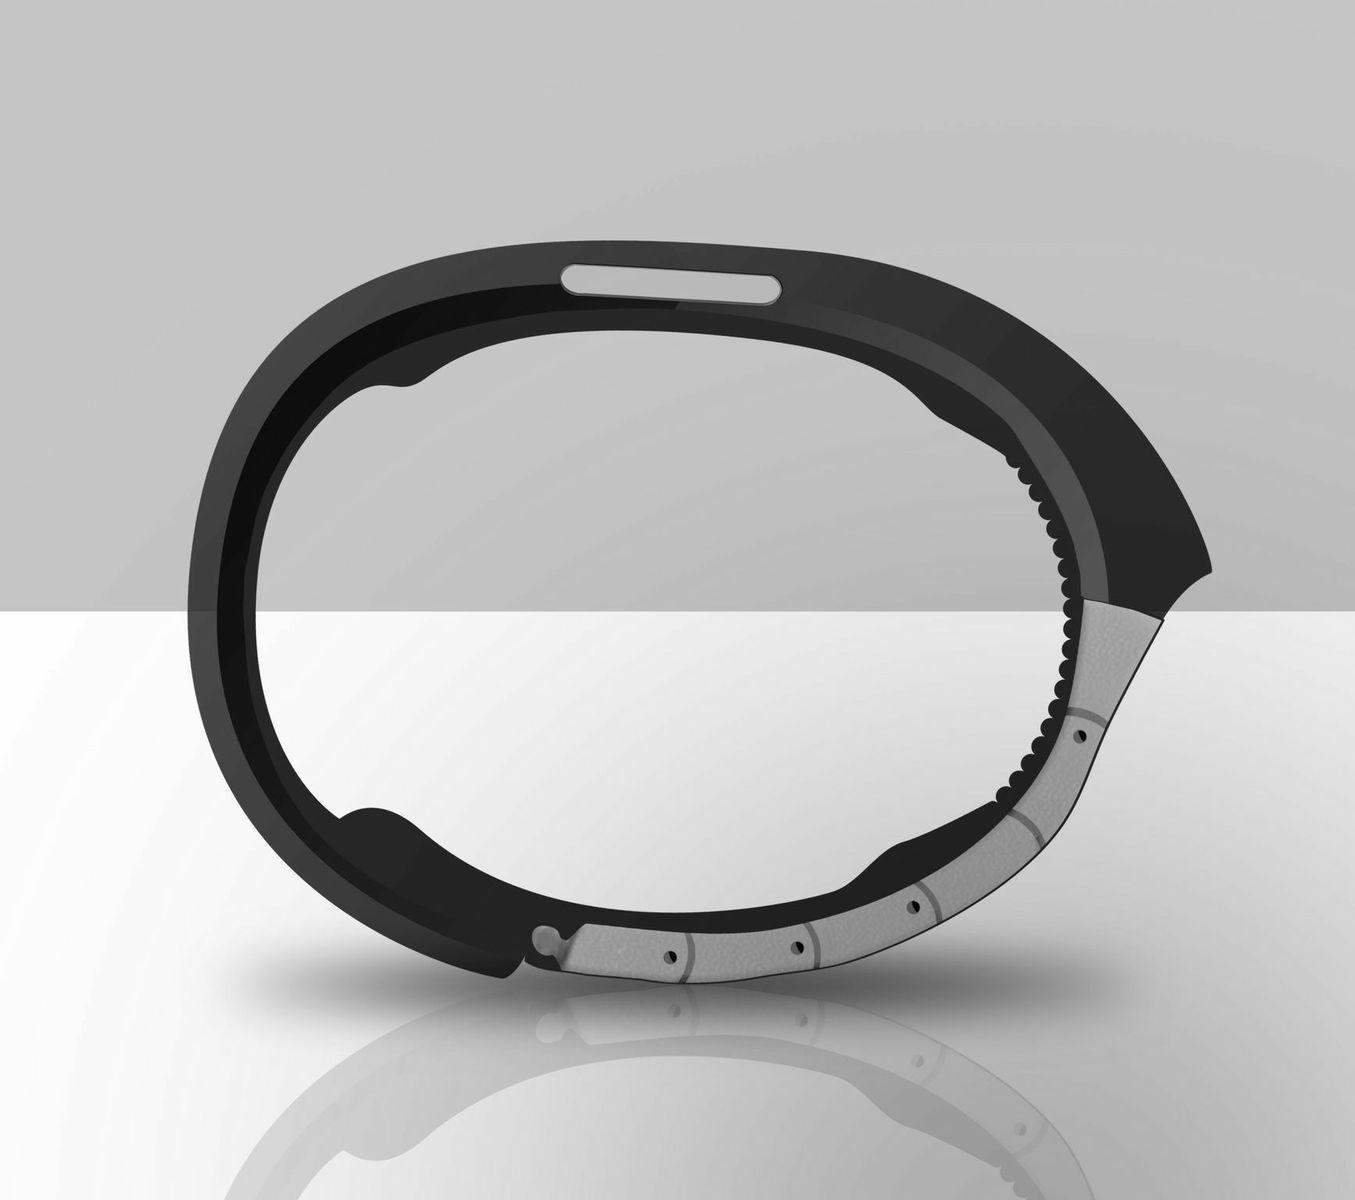 Samsung-Galaxy-Gear-Concept-Flexibile-2